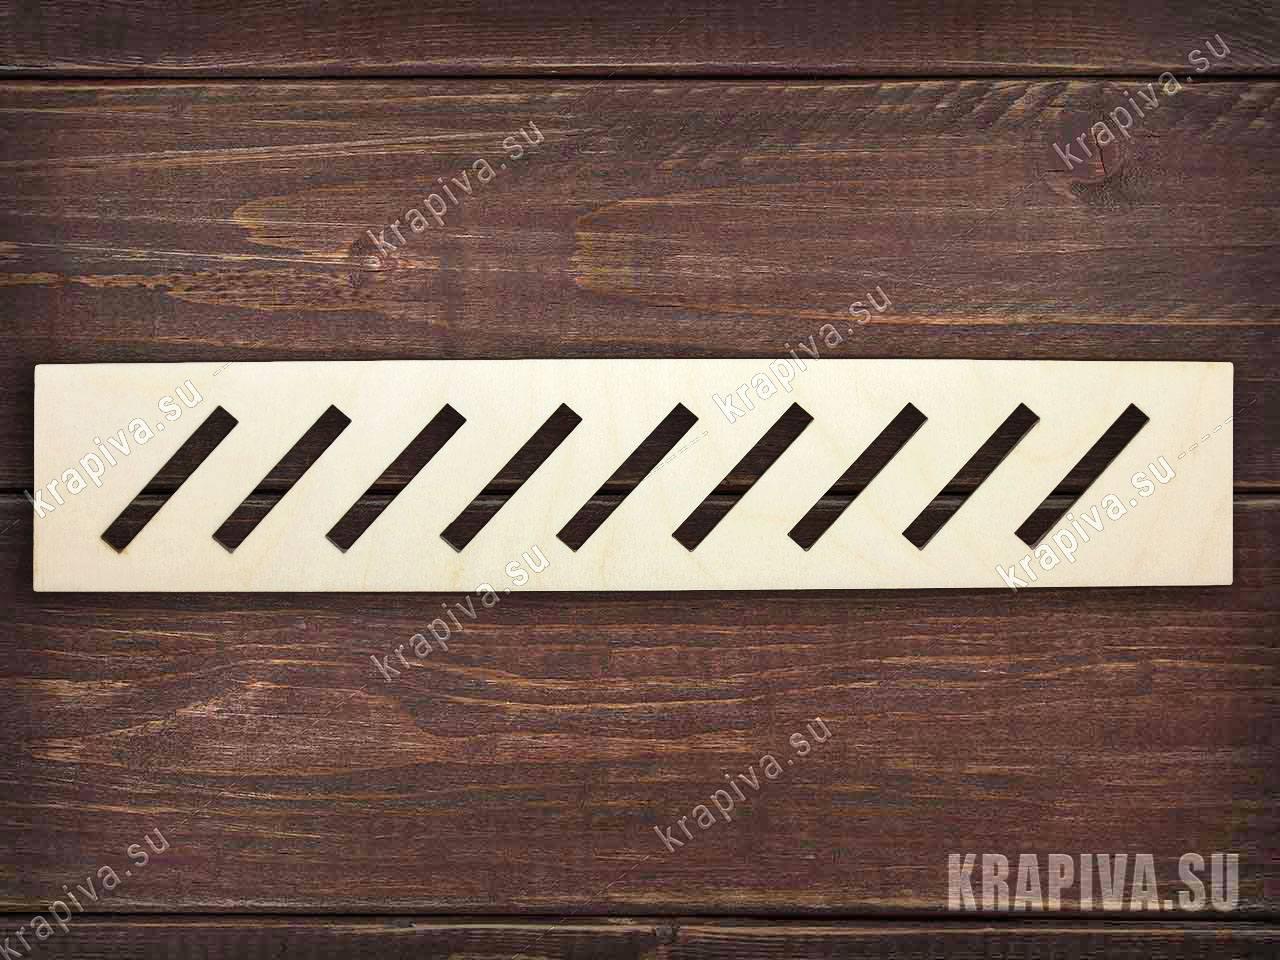 Развивающая линейка №7 за 46 руб. в магазине Крапива (krapiva.su) (фото)